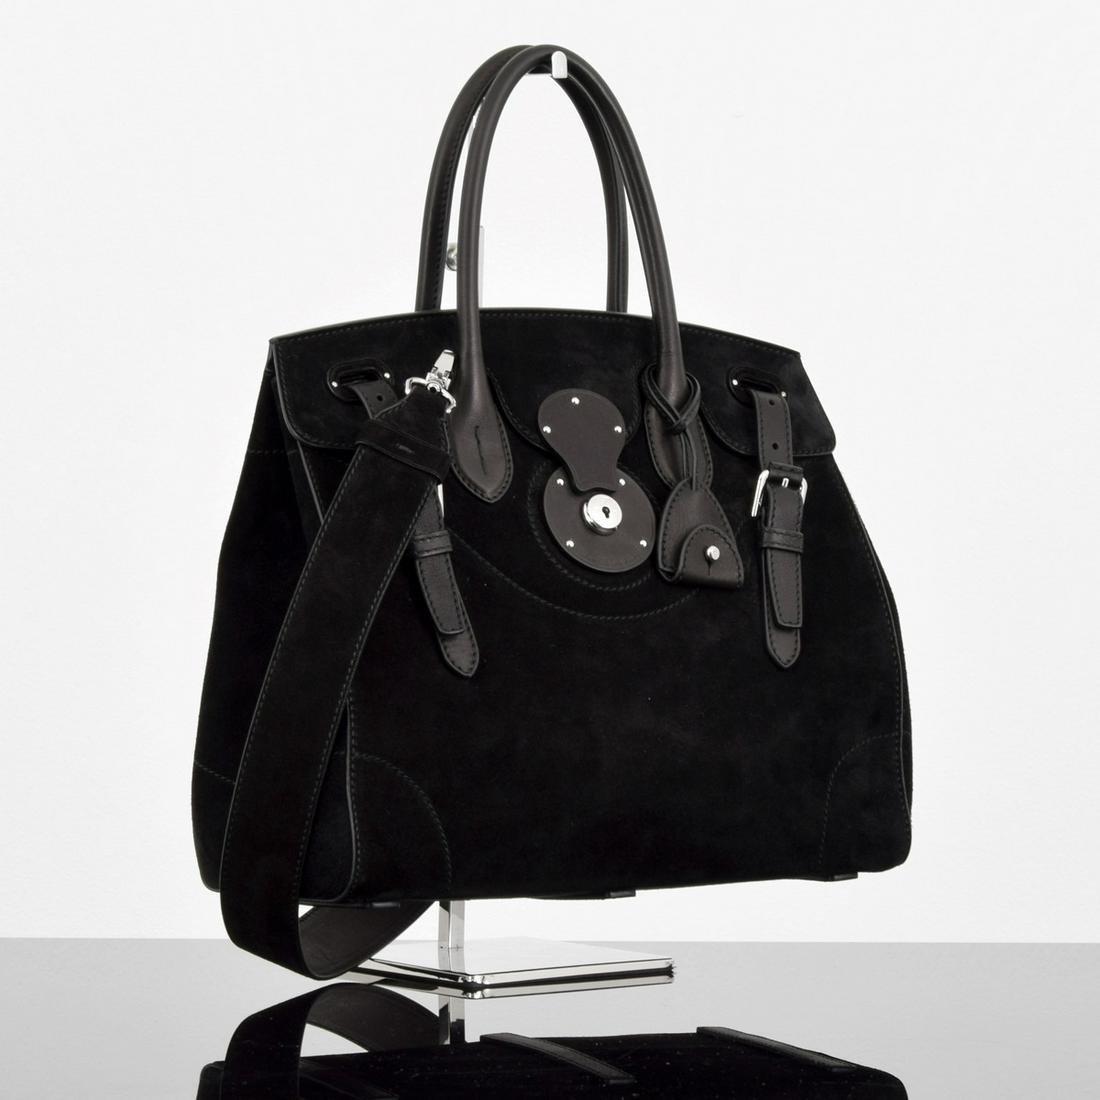 Ralph Lauren Light Ricky Bag, Black Suede